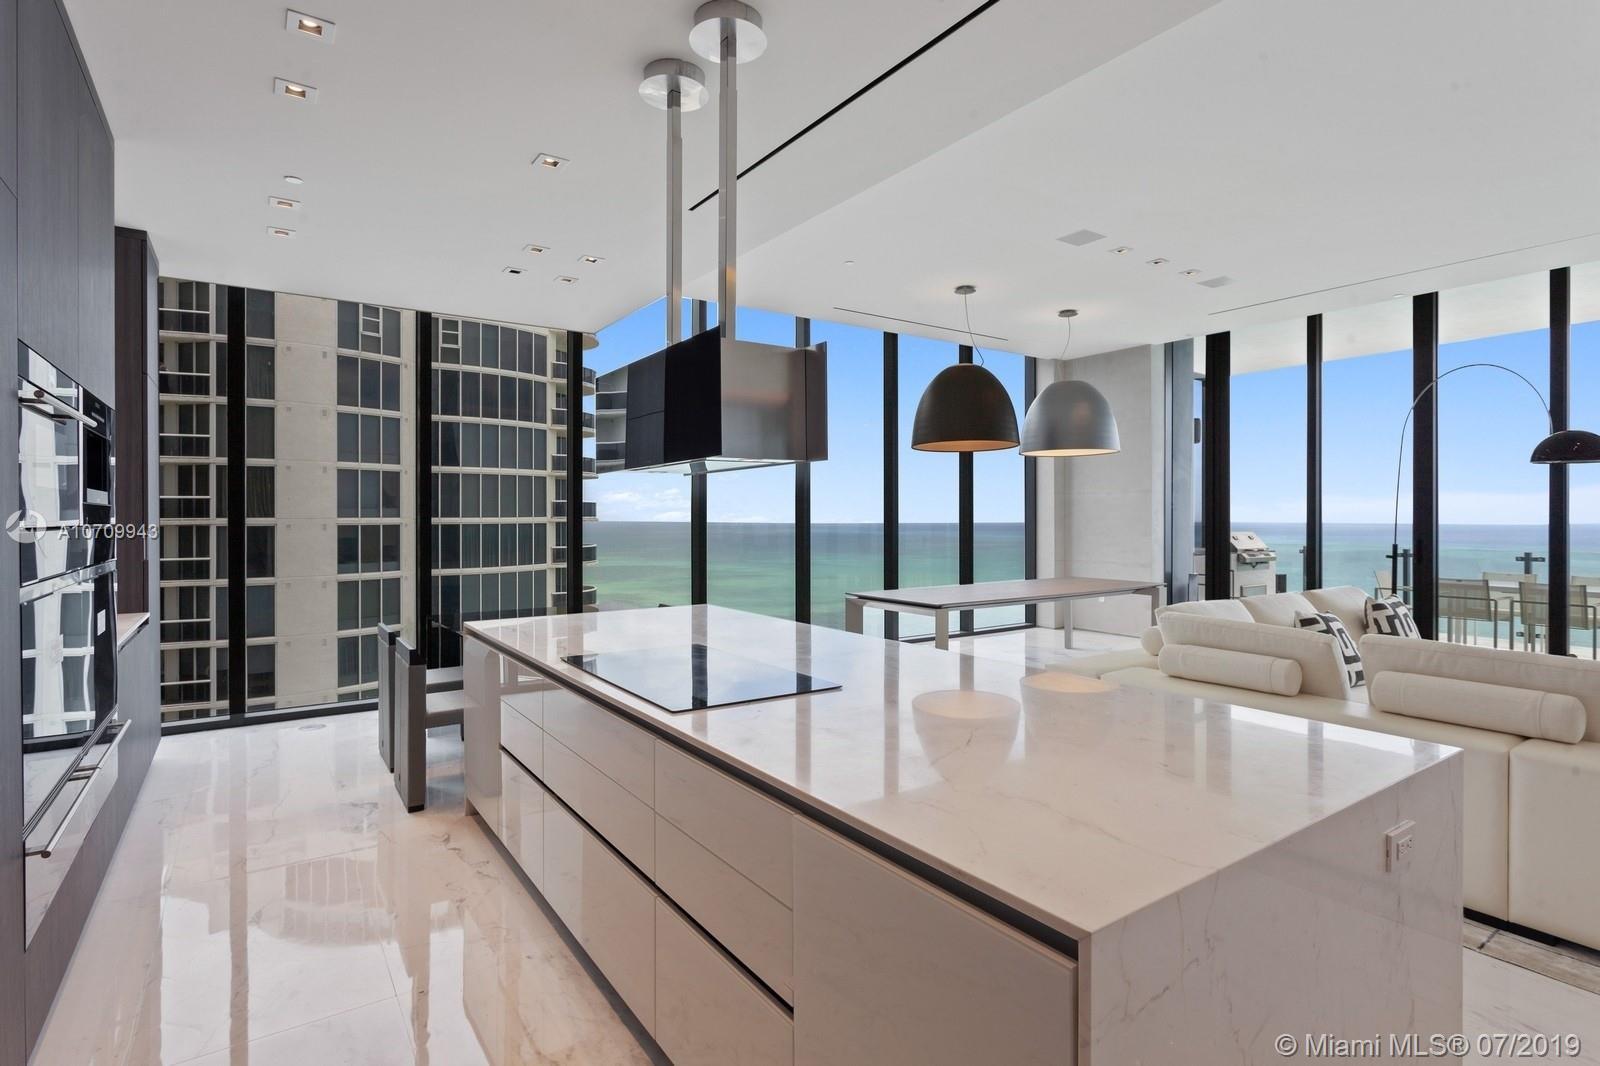 Аренда квартиры по адресу 17141 Collins Avenue, Sunny Isles Beach, FL 33160 в США